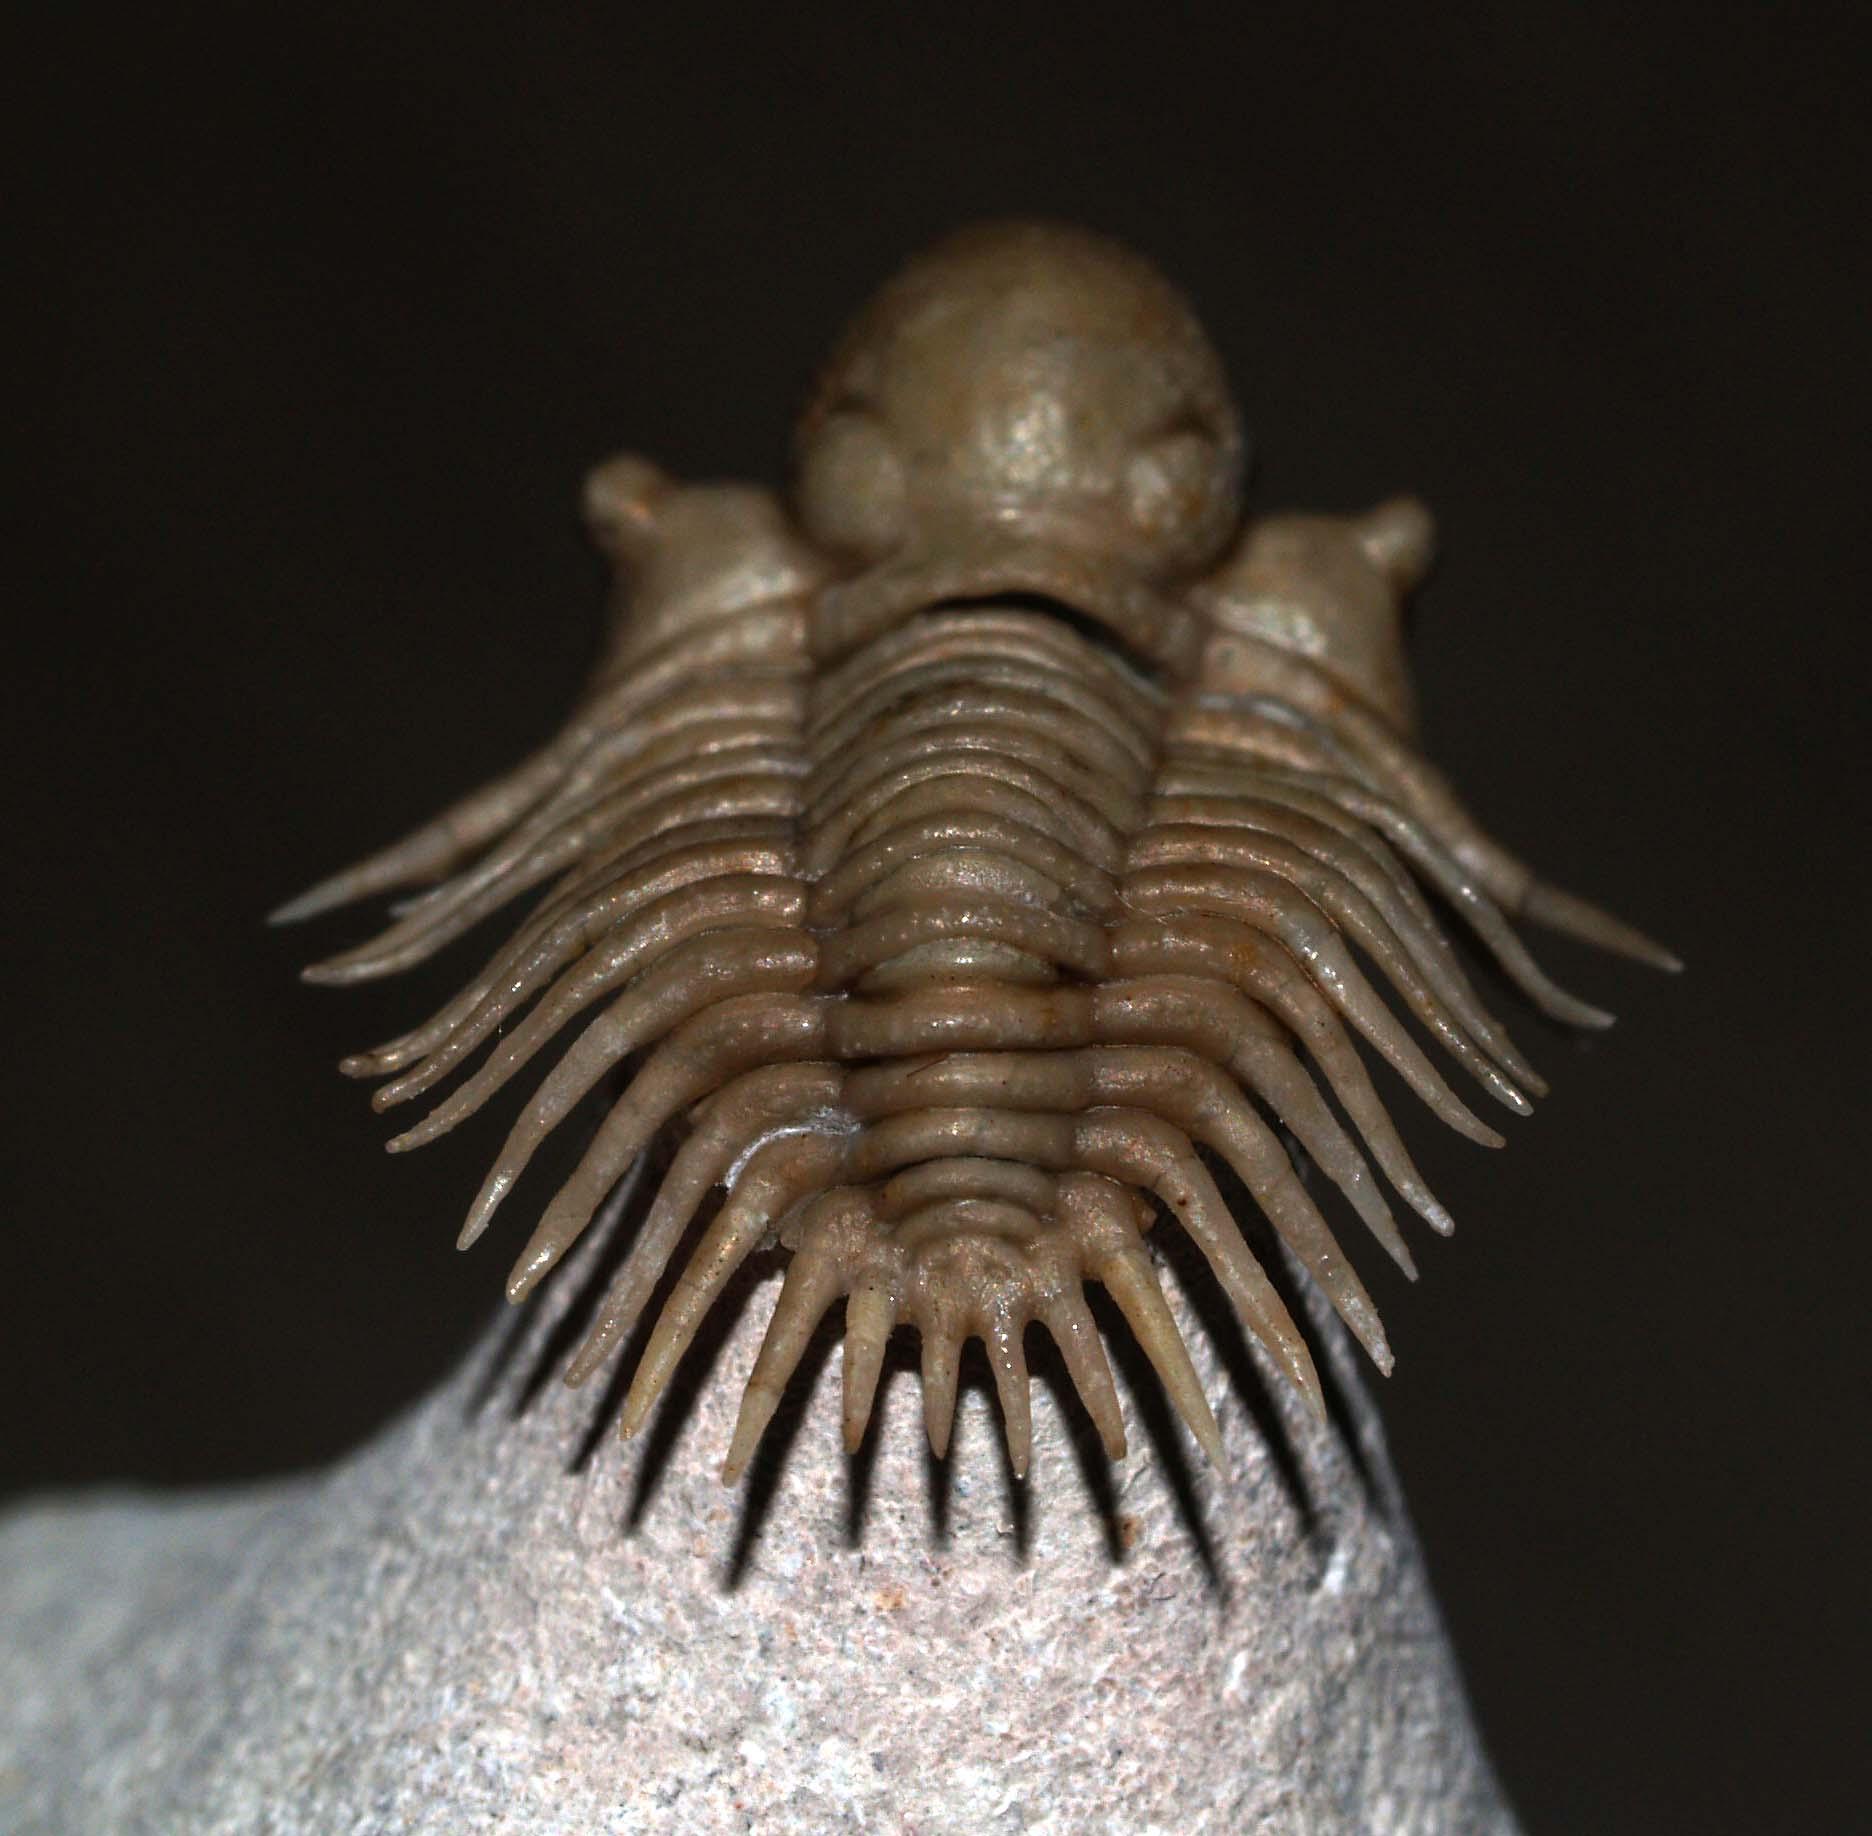 Pseudosphaerexochus pahnschi